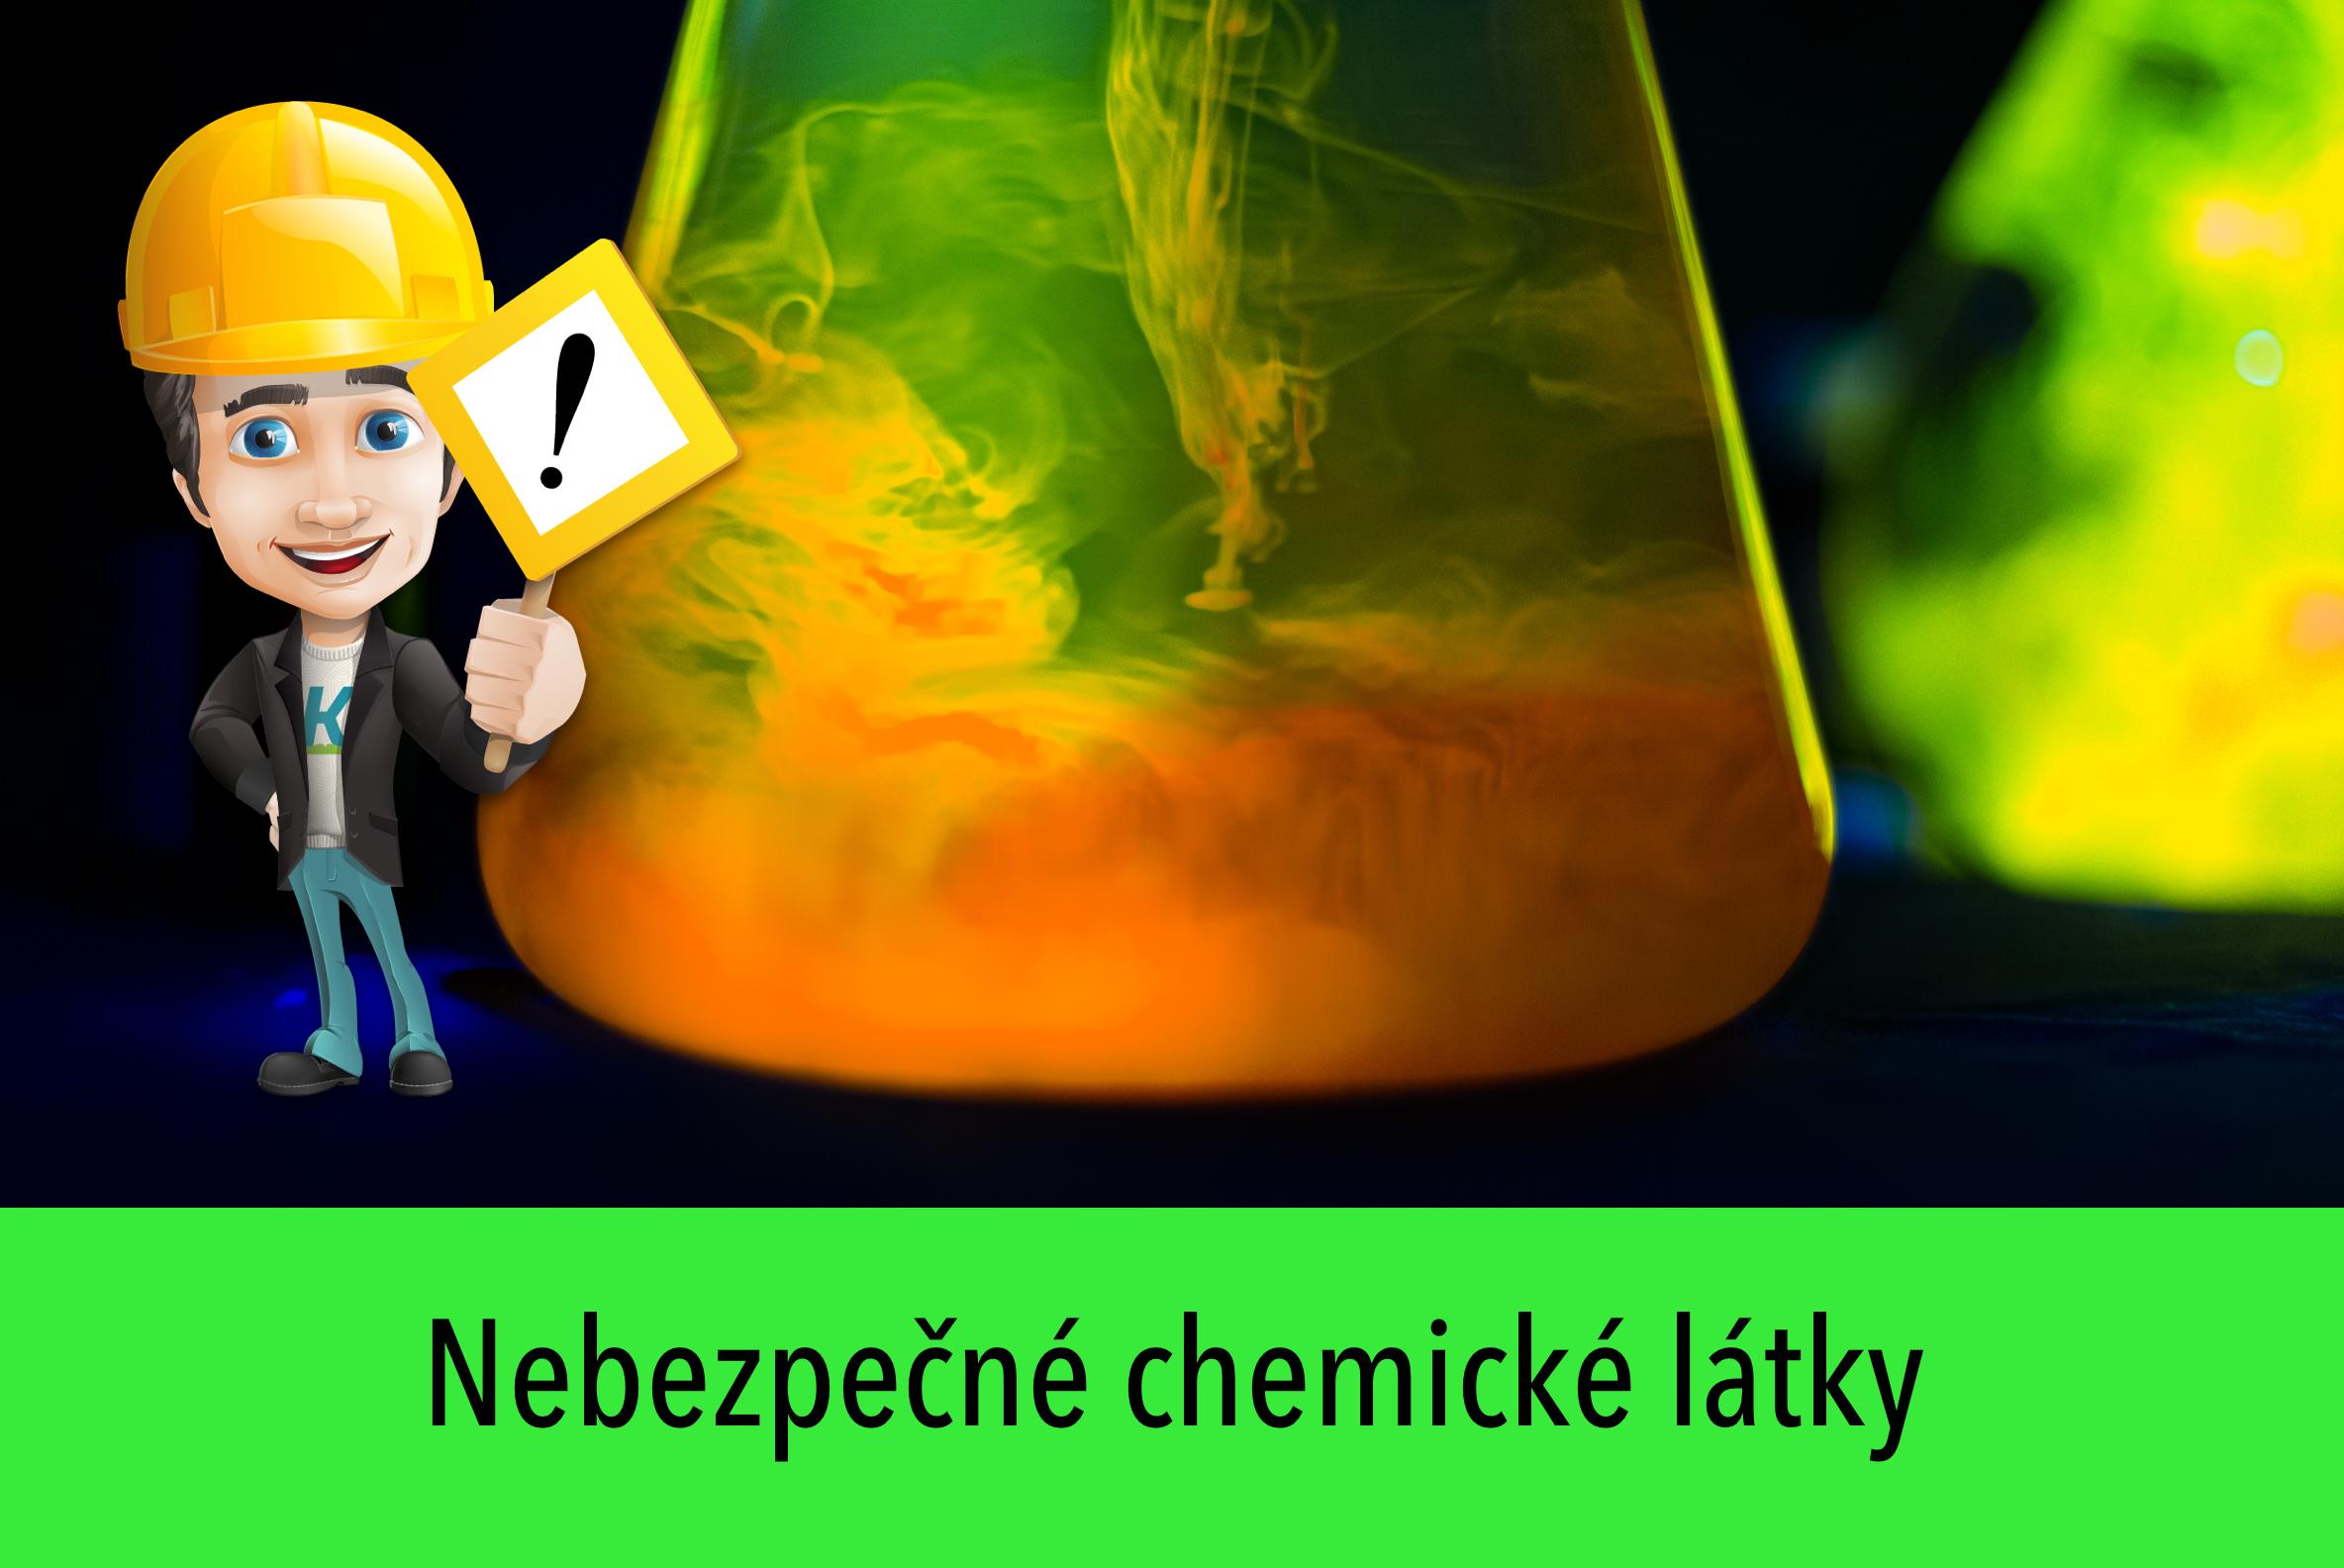 20190817173839 id 30f5af83 b4cd 4f87 9d33 cd8465ef59bf  nebezpecne chemicke latky 300dpi